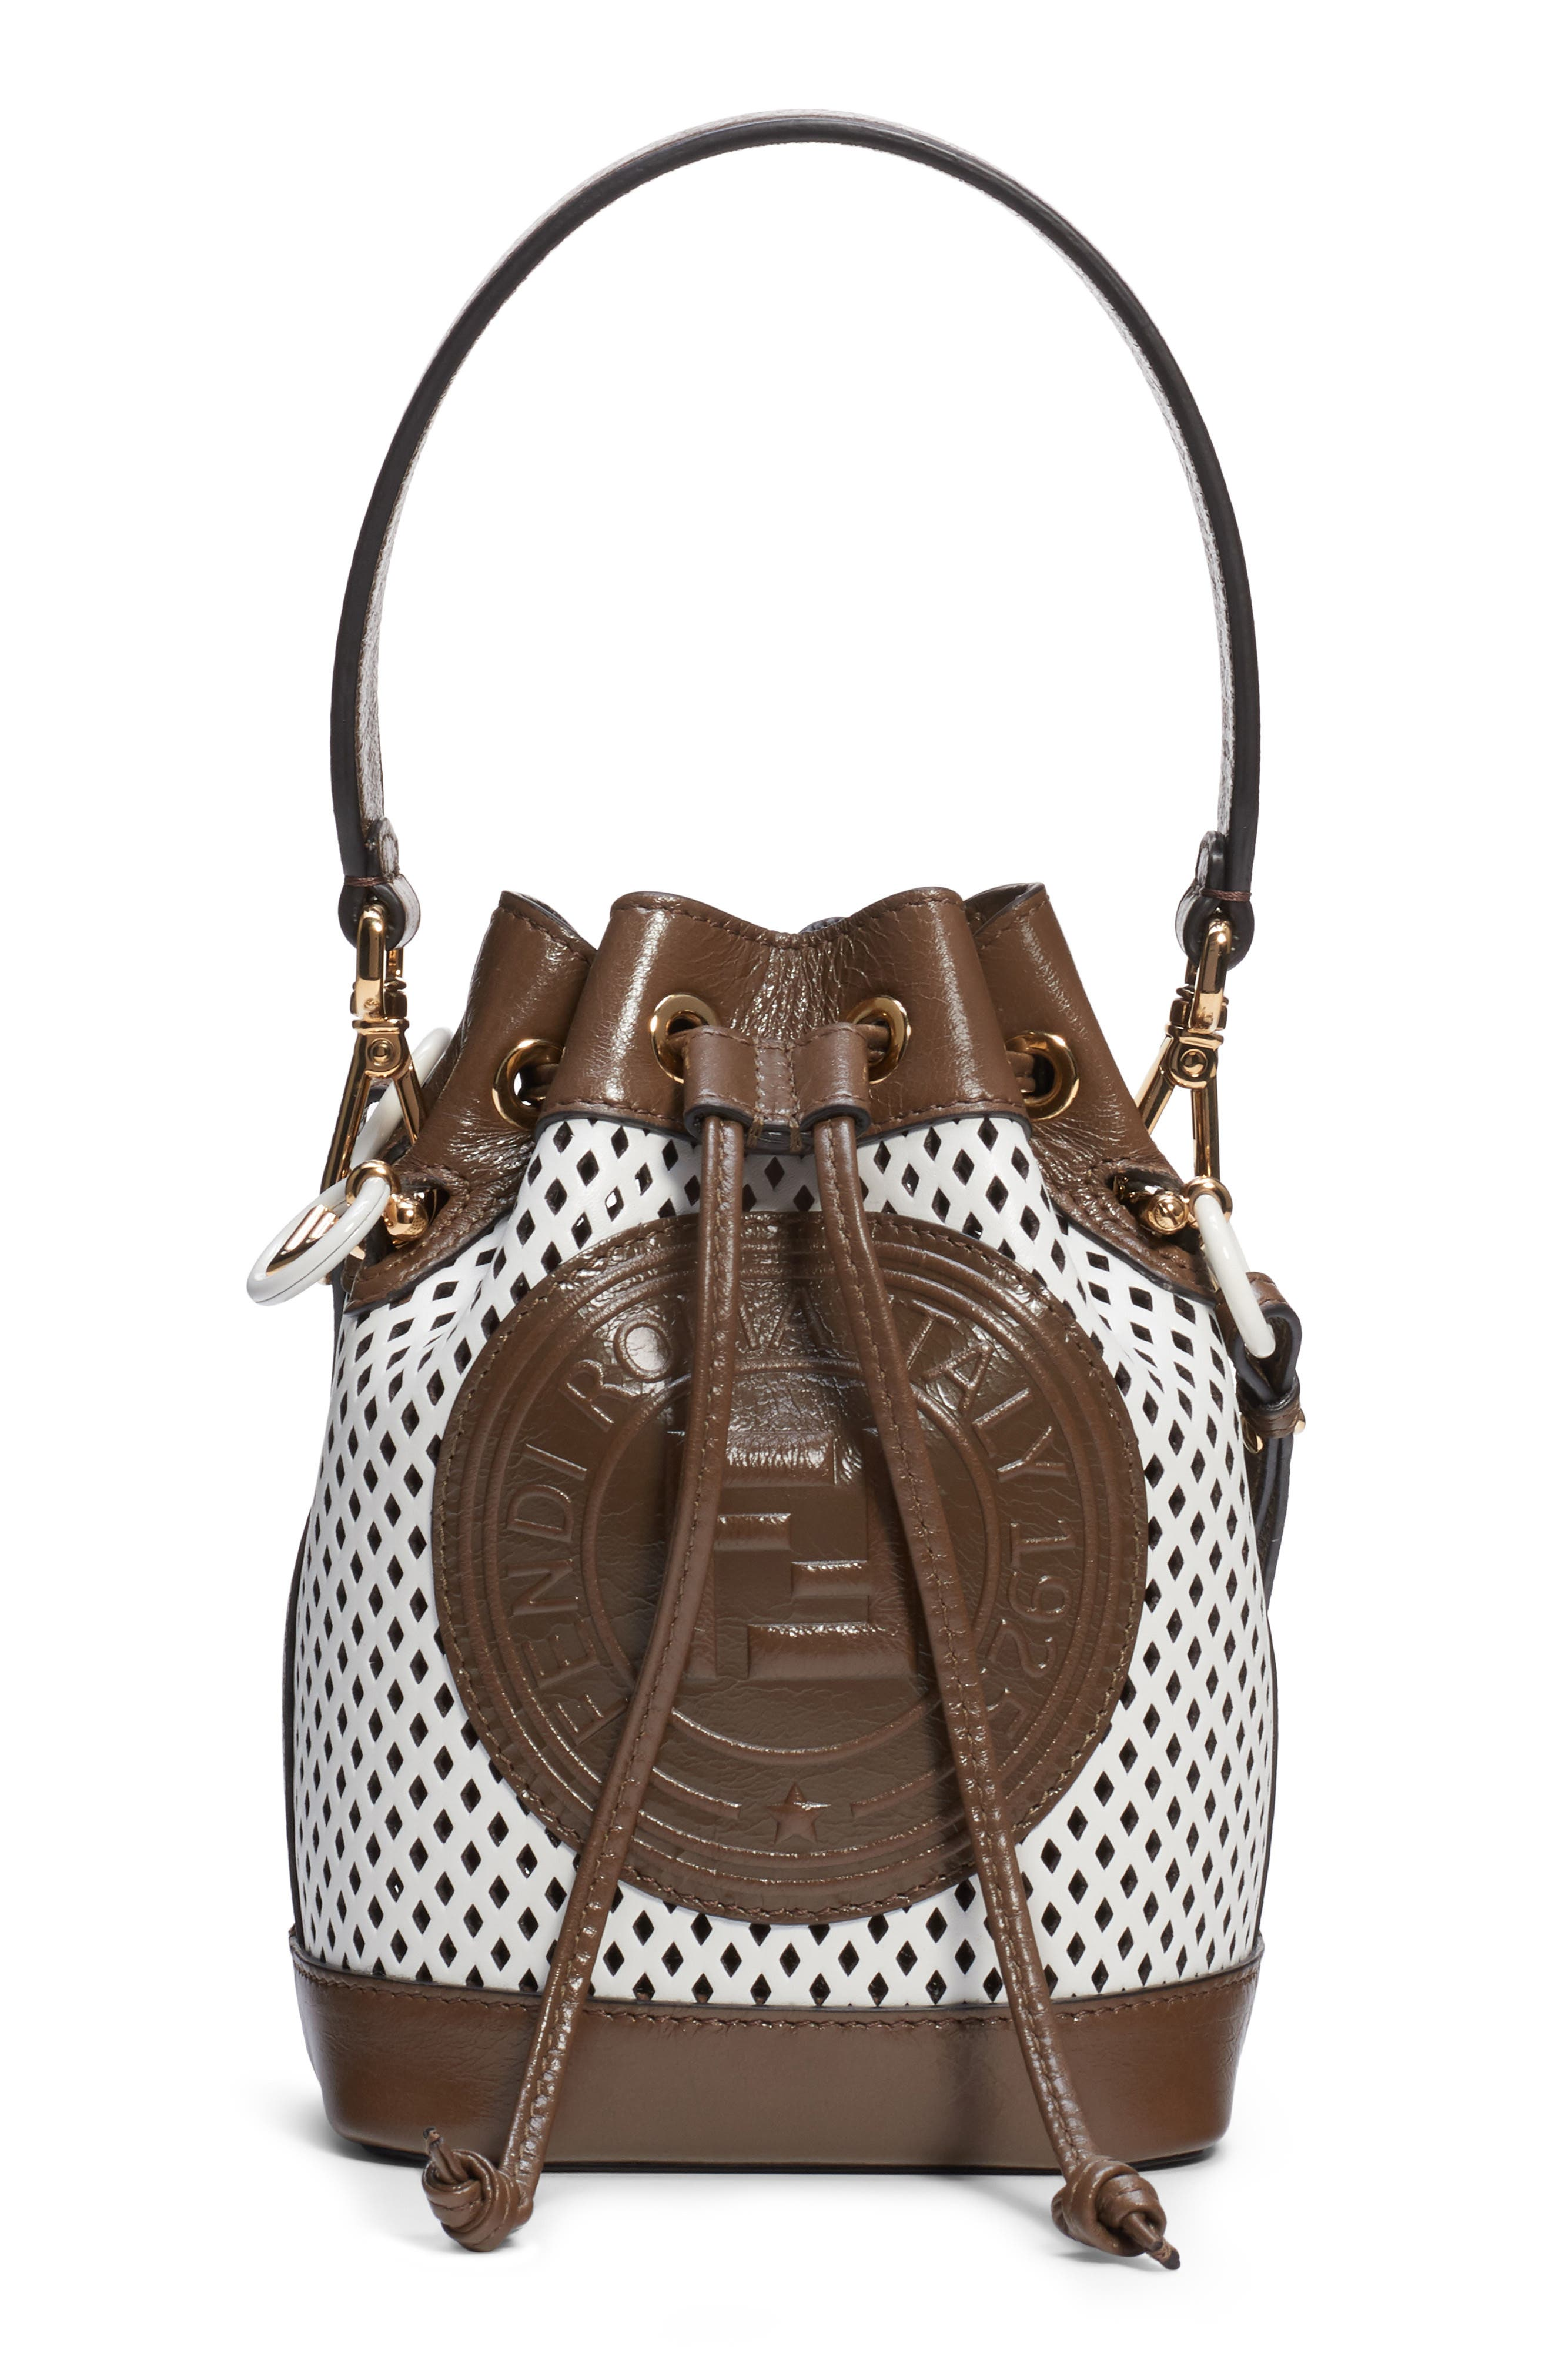 Fendi Mini Mon Tresor Perforated Leather Bucket Bag | Nordstrom